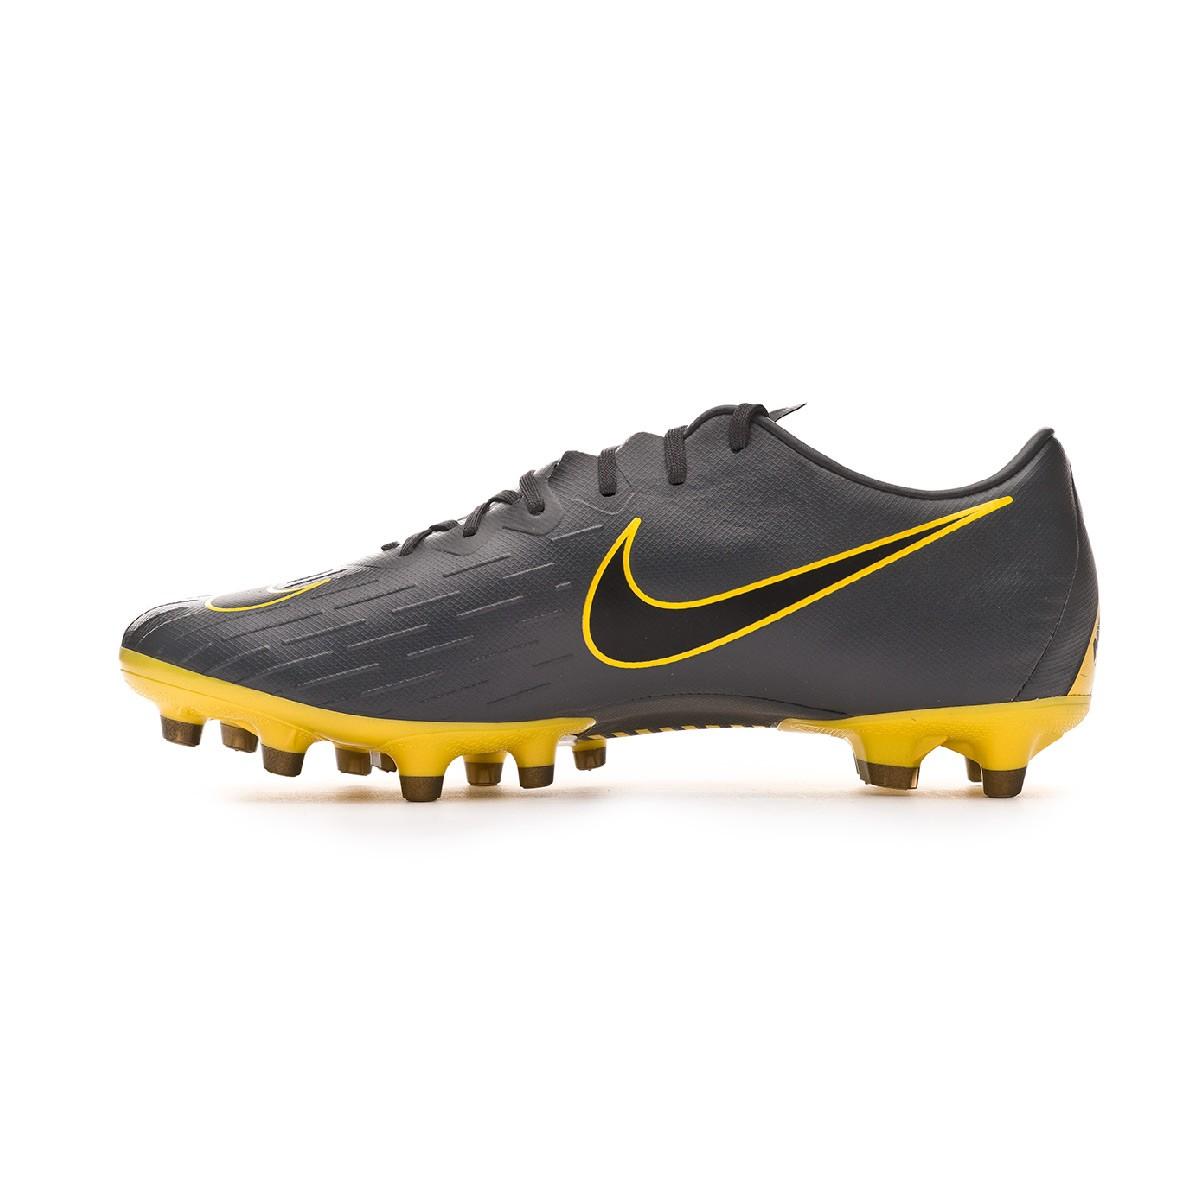 fafd536f52e8 Football Boots Nike Mercurial Vapor XII Pro AG-Pro Dark grey-Black-Optical  yellow - Football store Fútbol Emotion